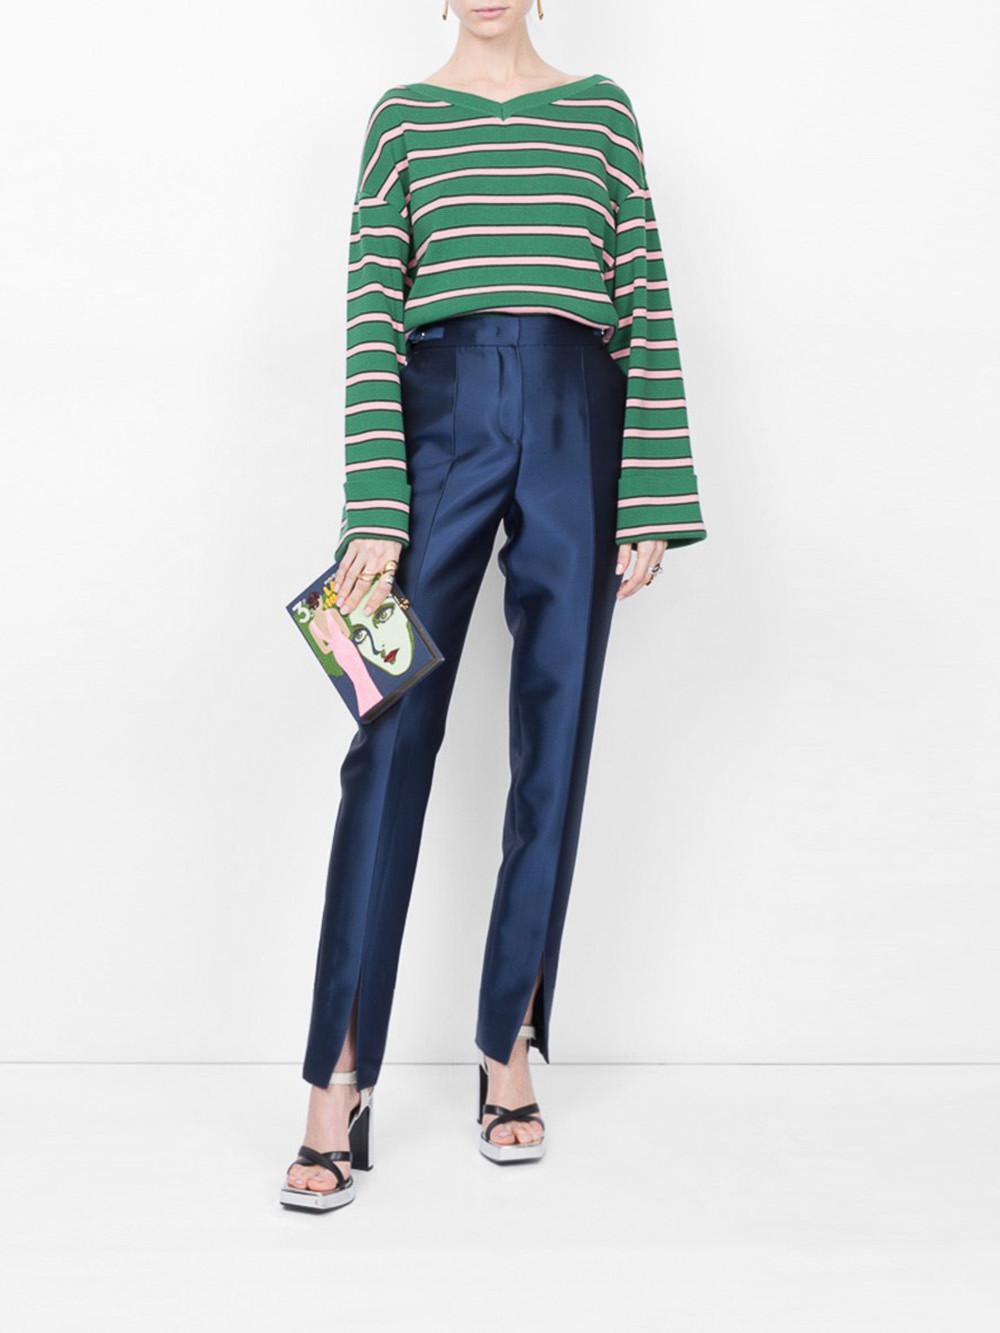 711edd59af40 Lyst - ALEXACHUNG Oversized Striped Sweater in Green